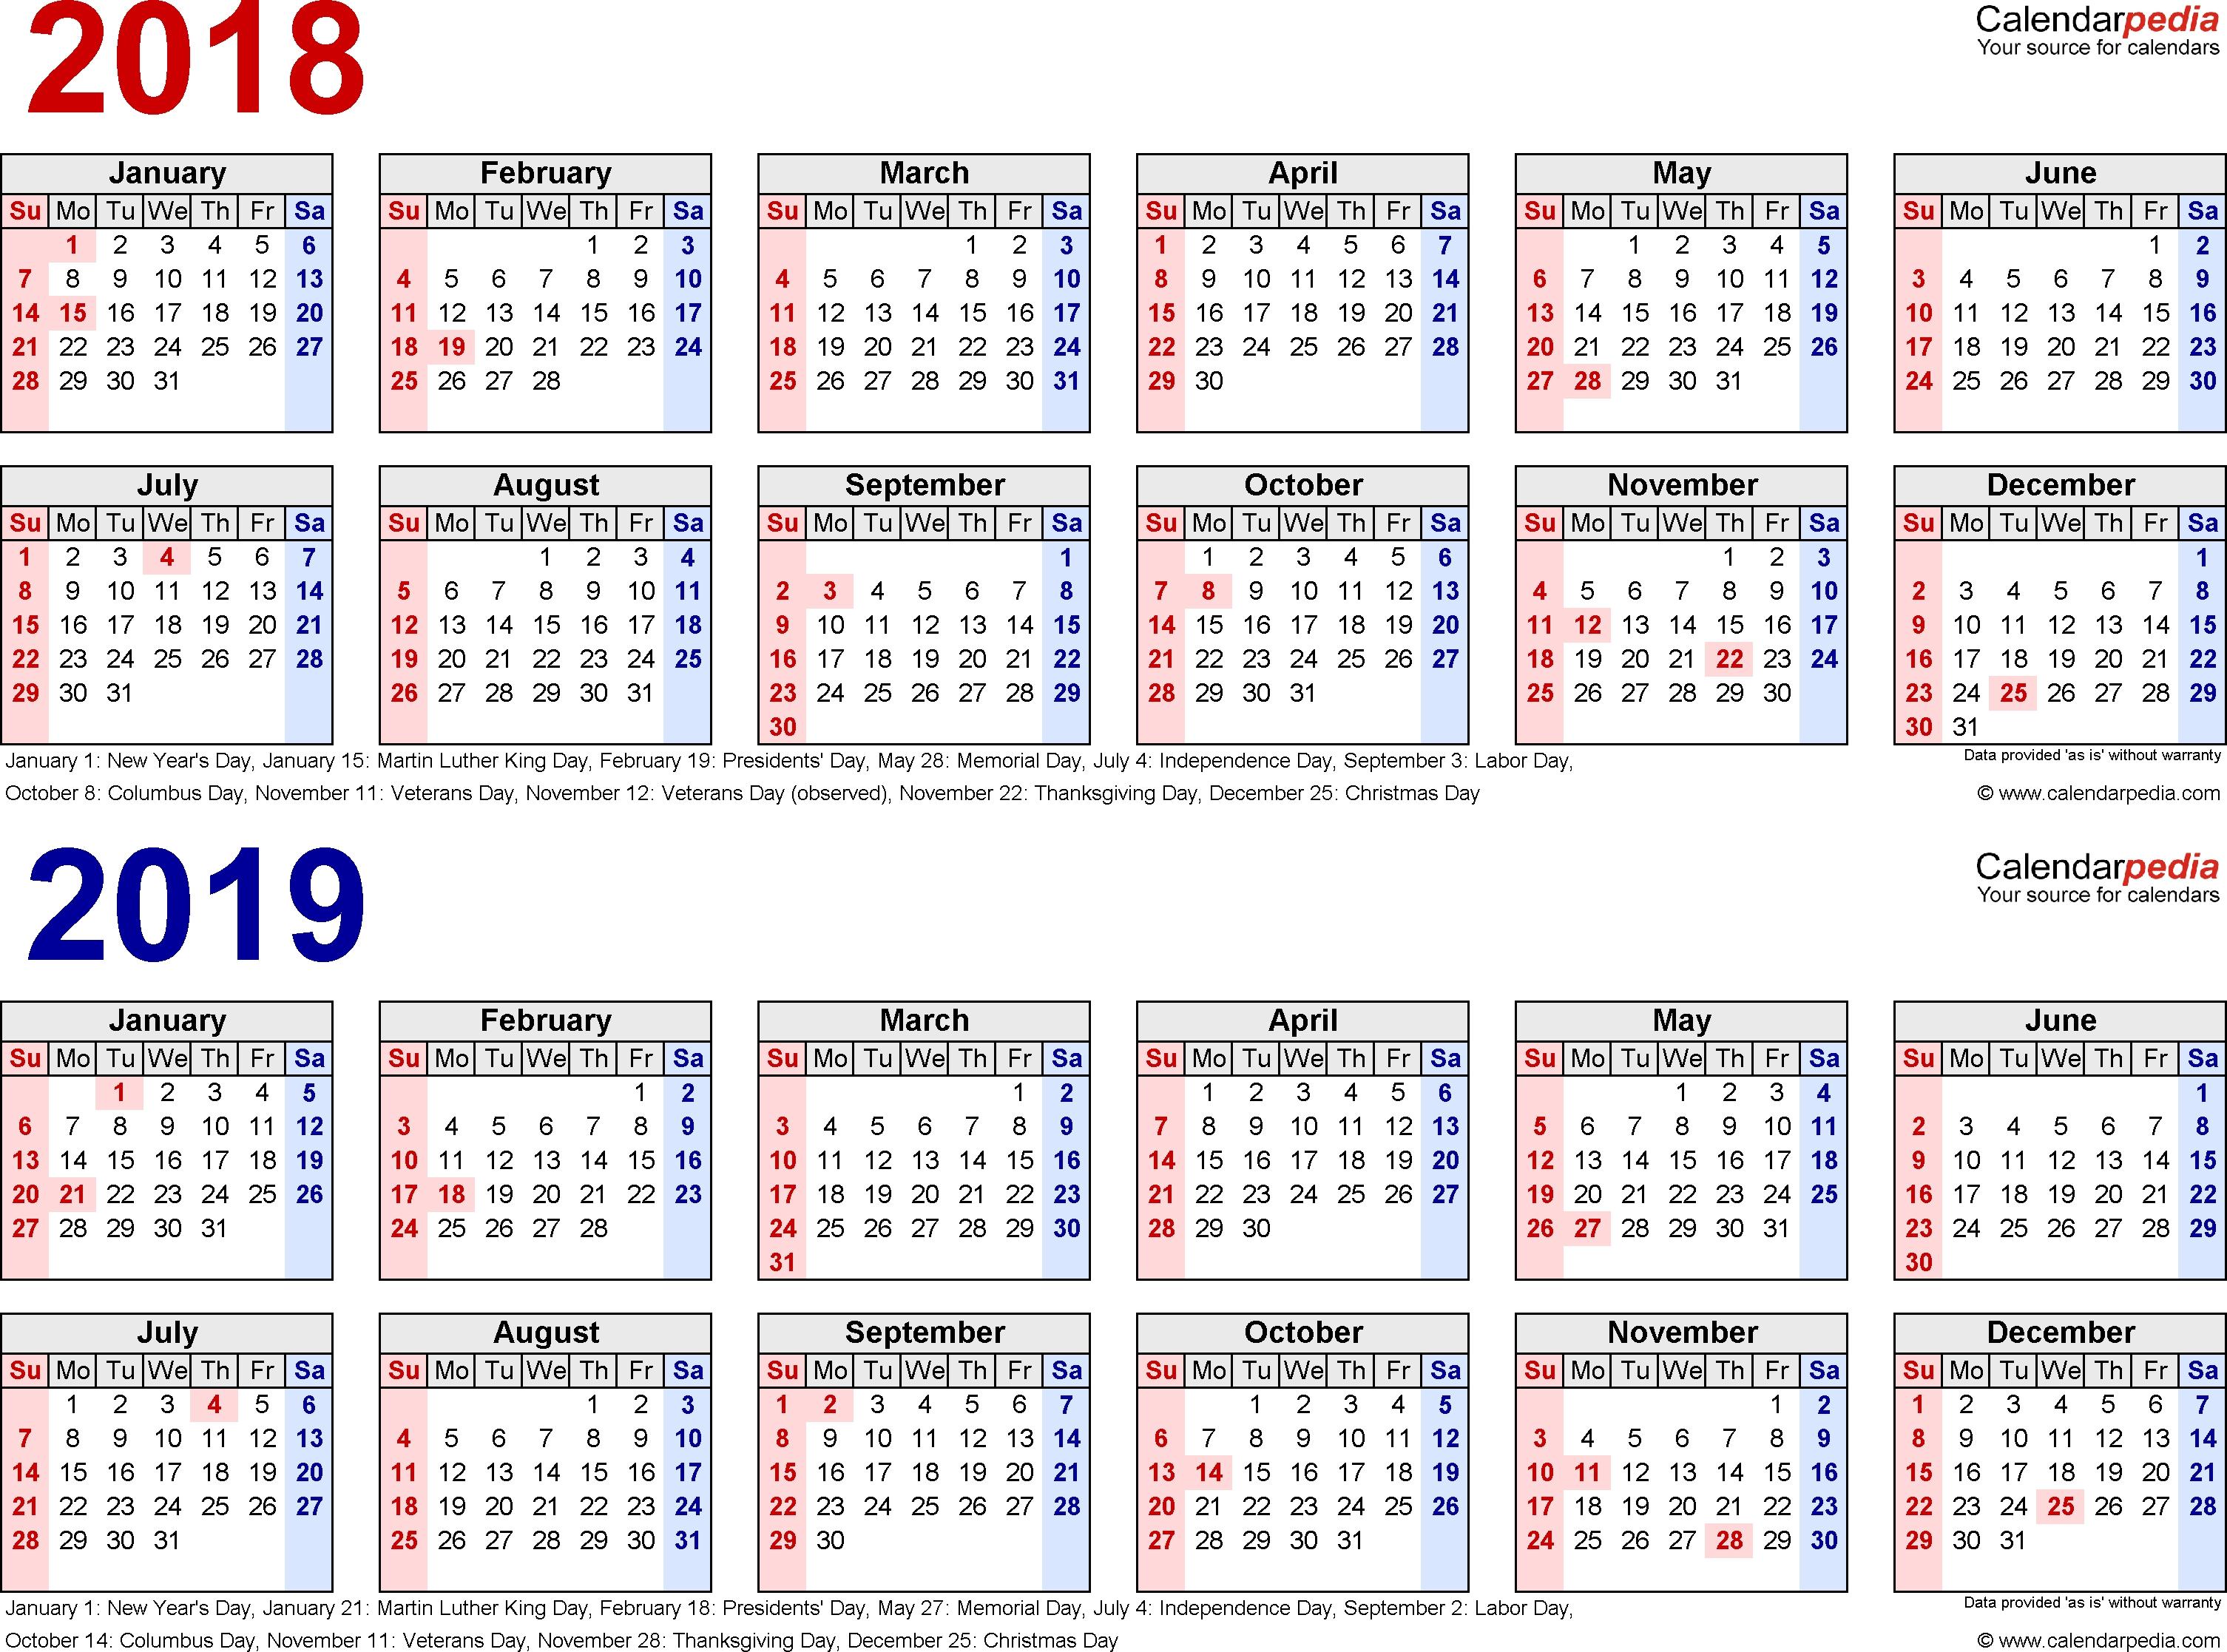 2018-2019 Calendar - Free Printable Two-Year Word Calendars intended for 3 Year Calendar Printable 2018 2019 2020